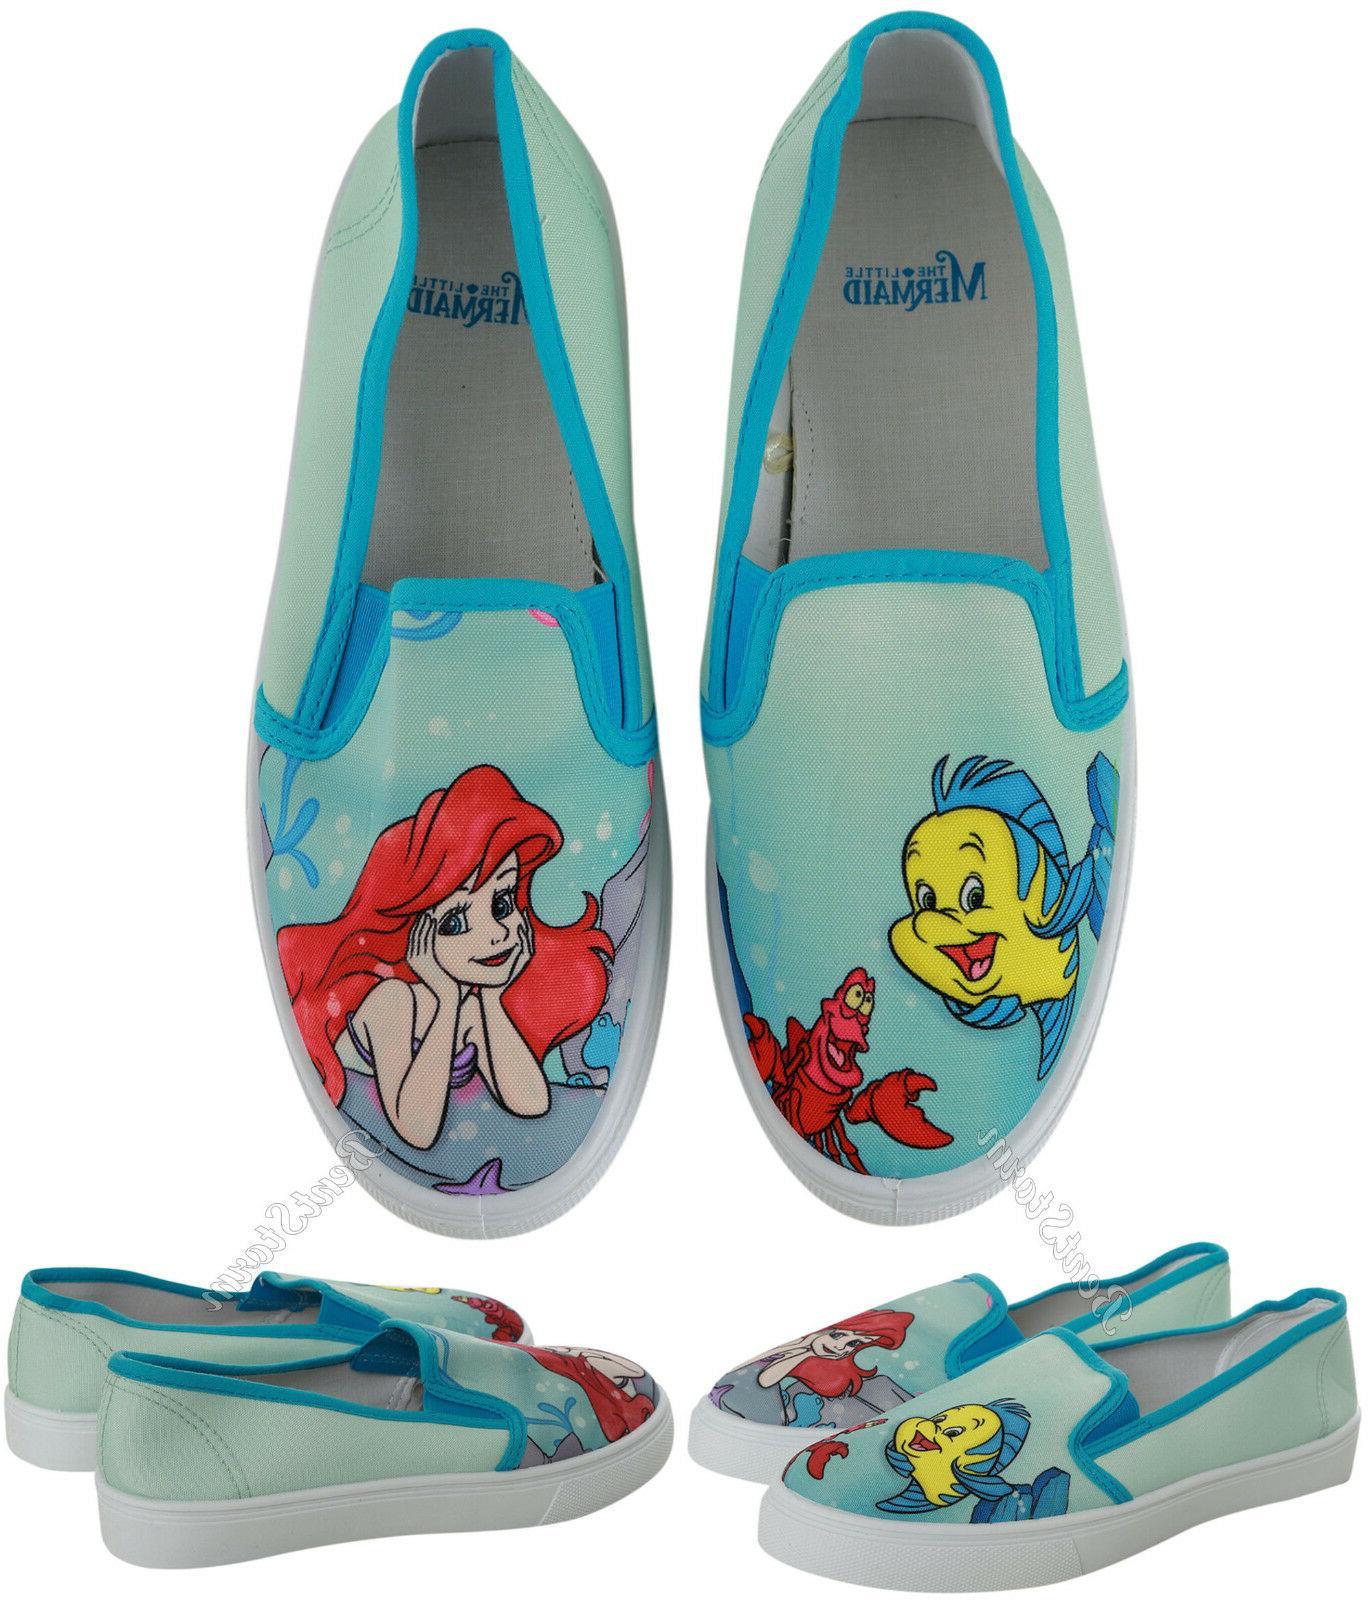 ariel flounder sebastian the little mermaid womens